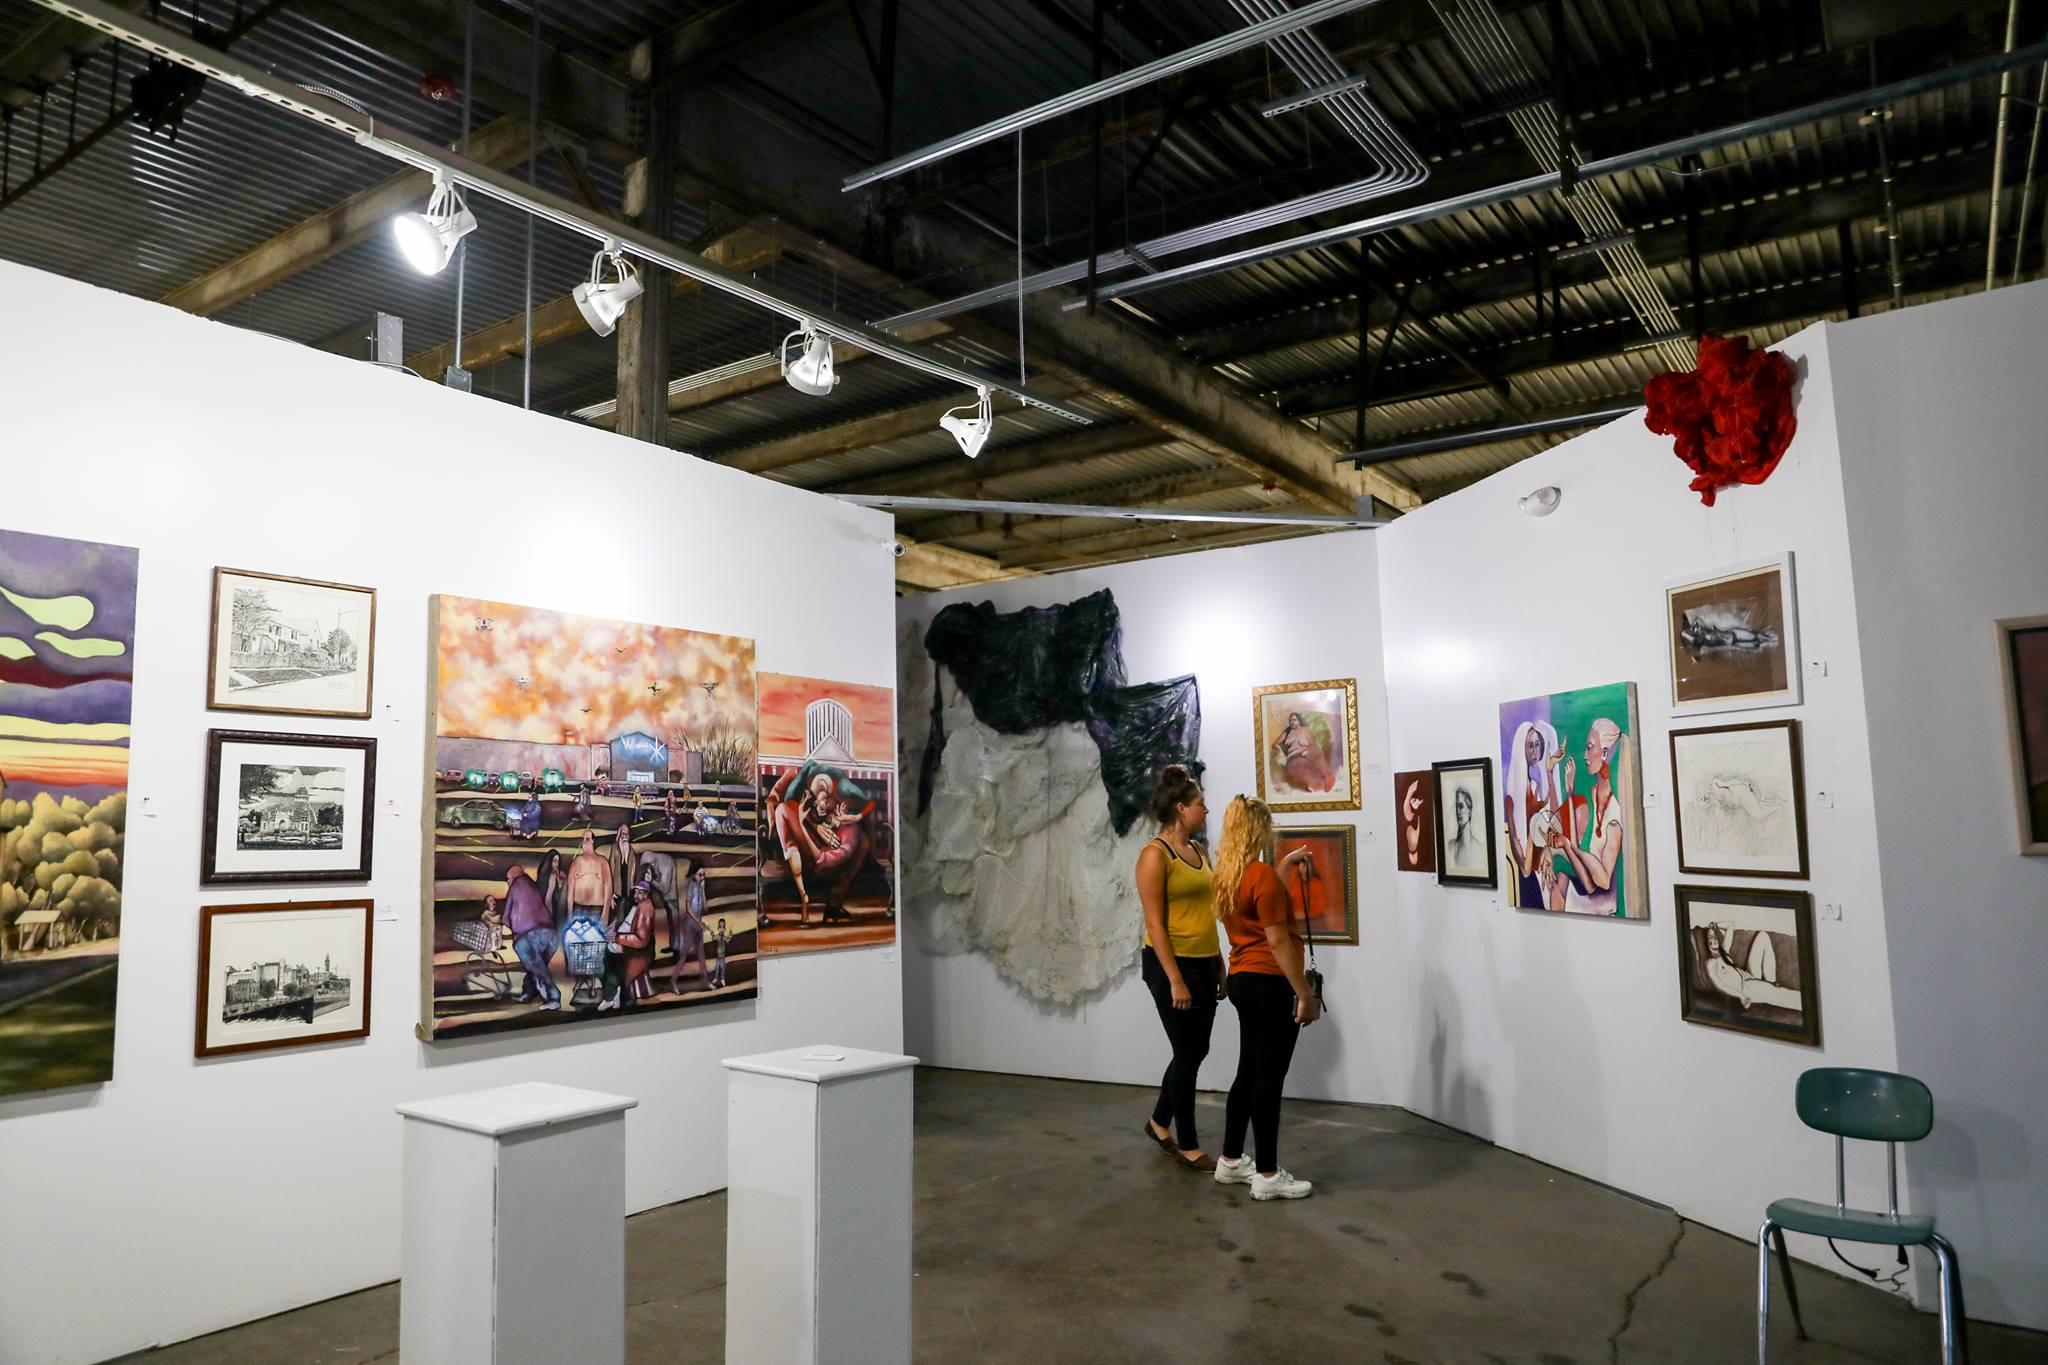 Chromedge Studios - 27 Art Studios + Gallery